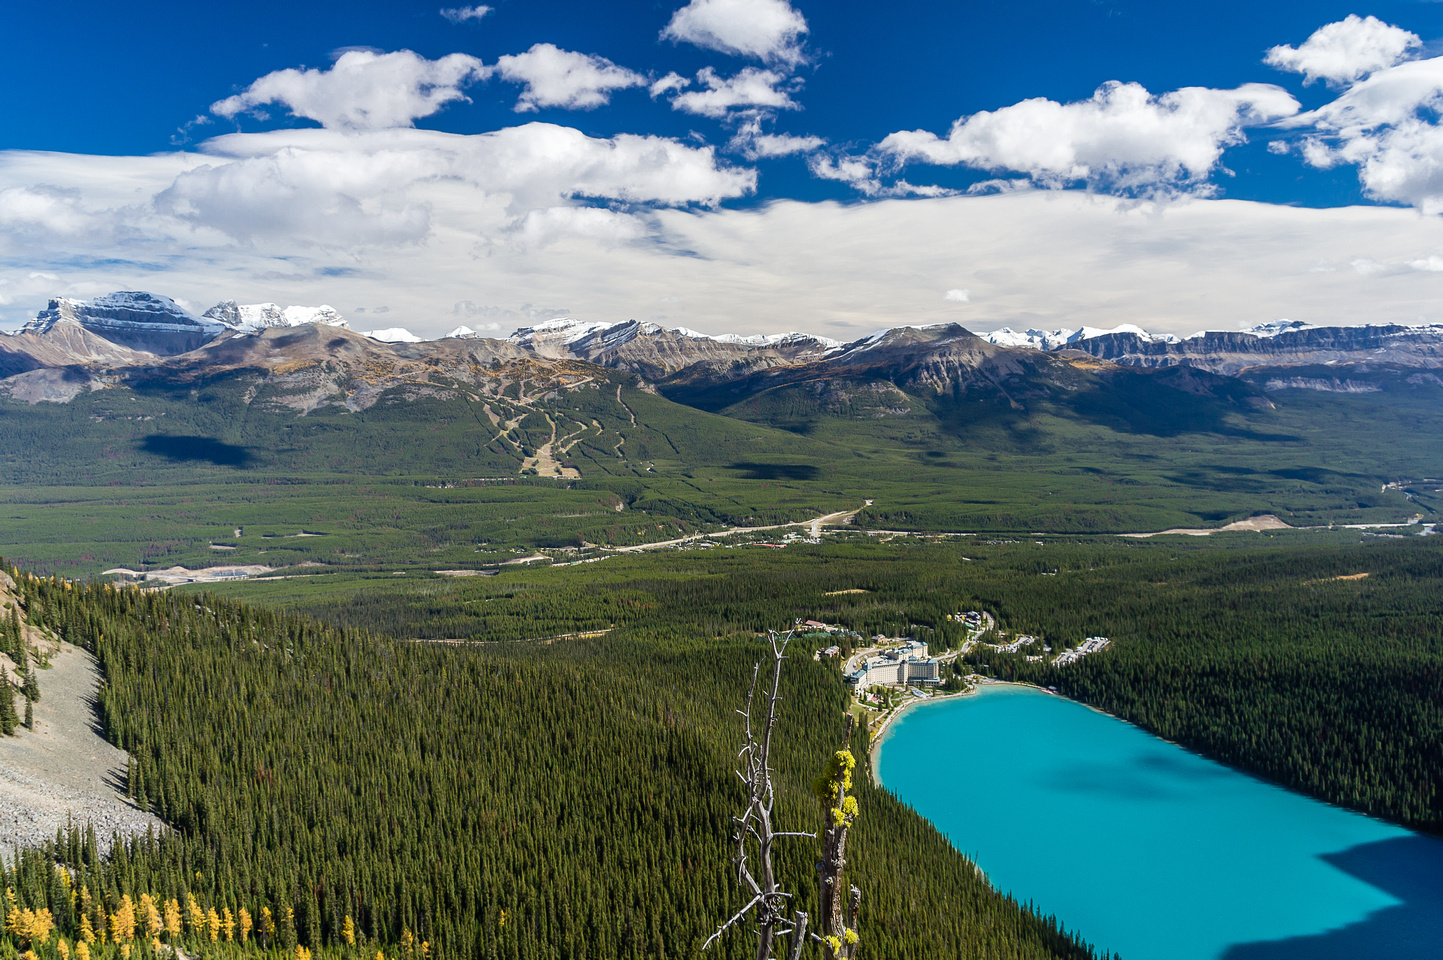 The Lake Louise ski resort lies across the TCH.